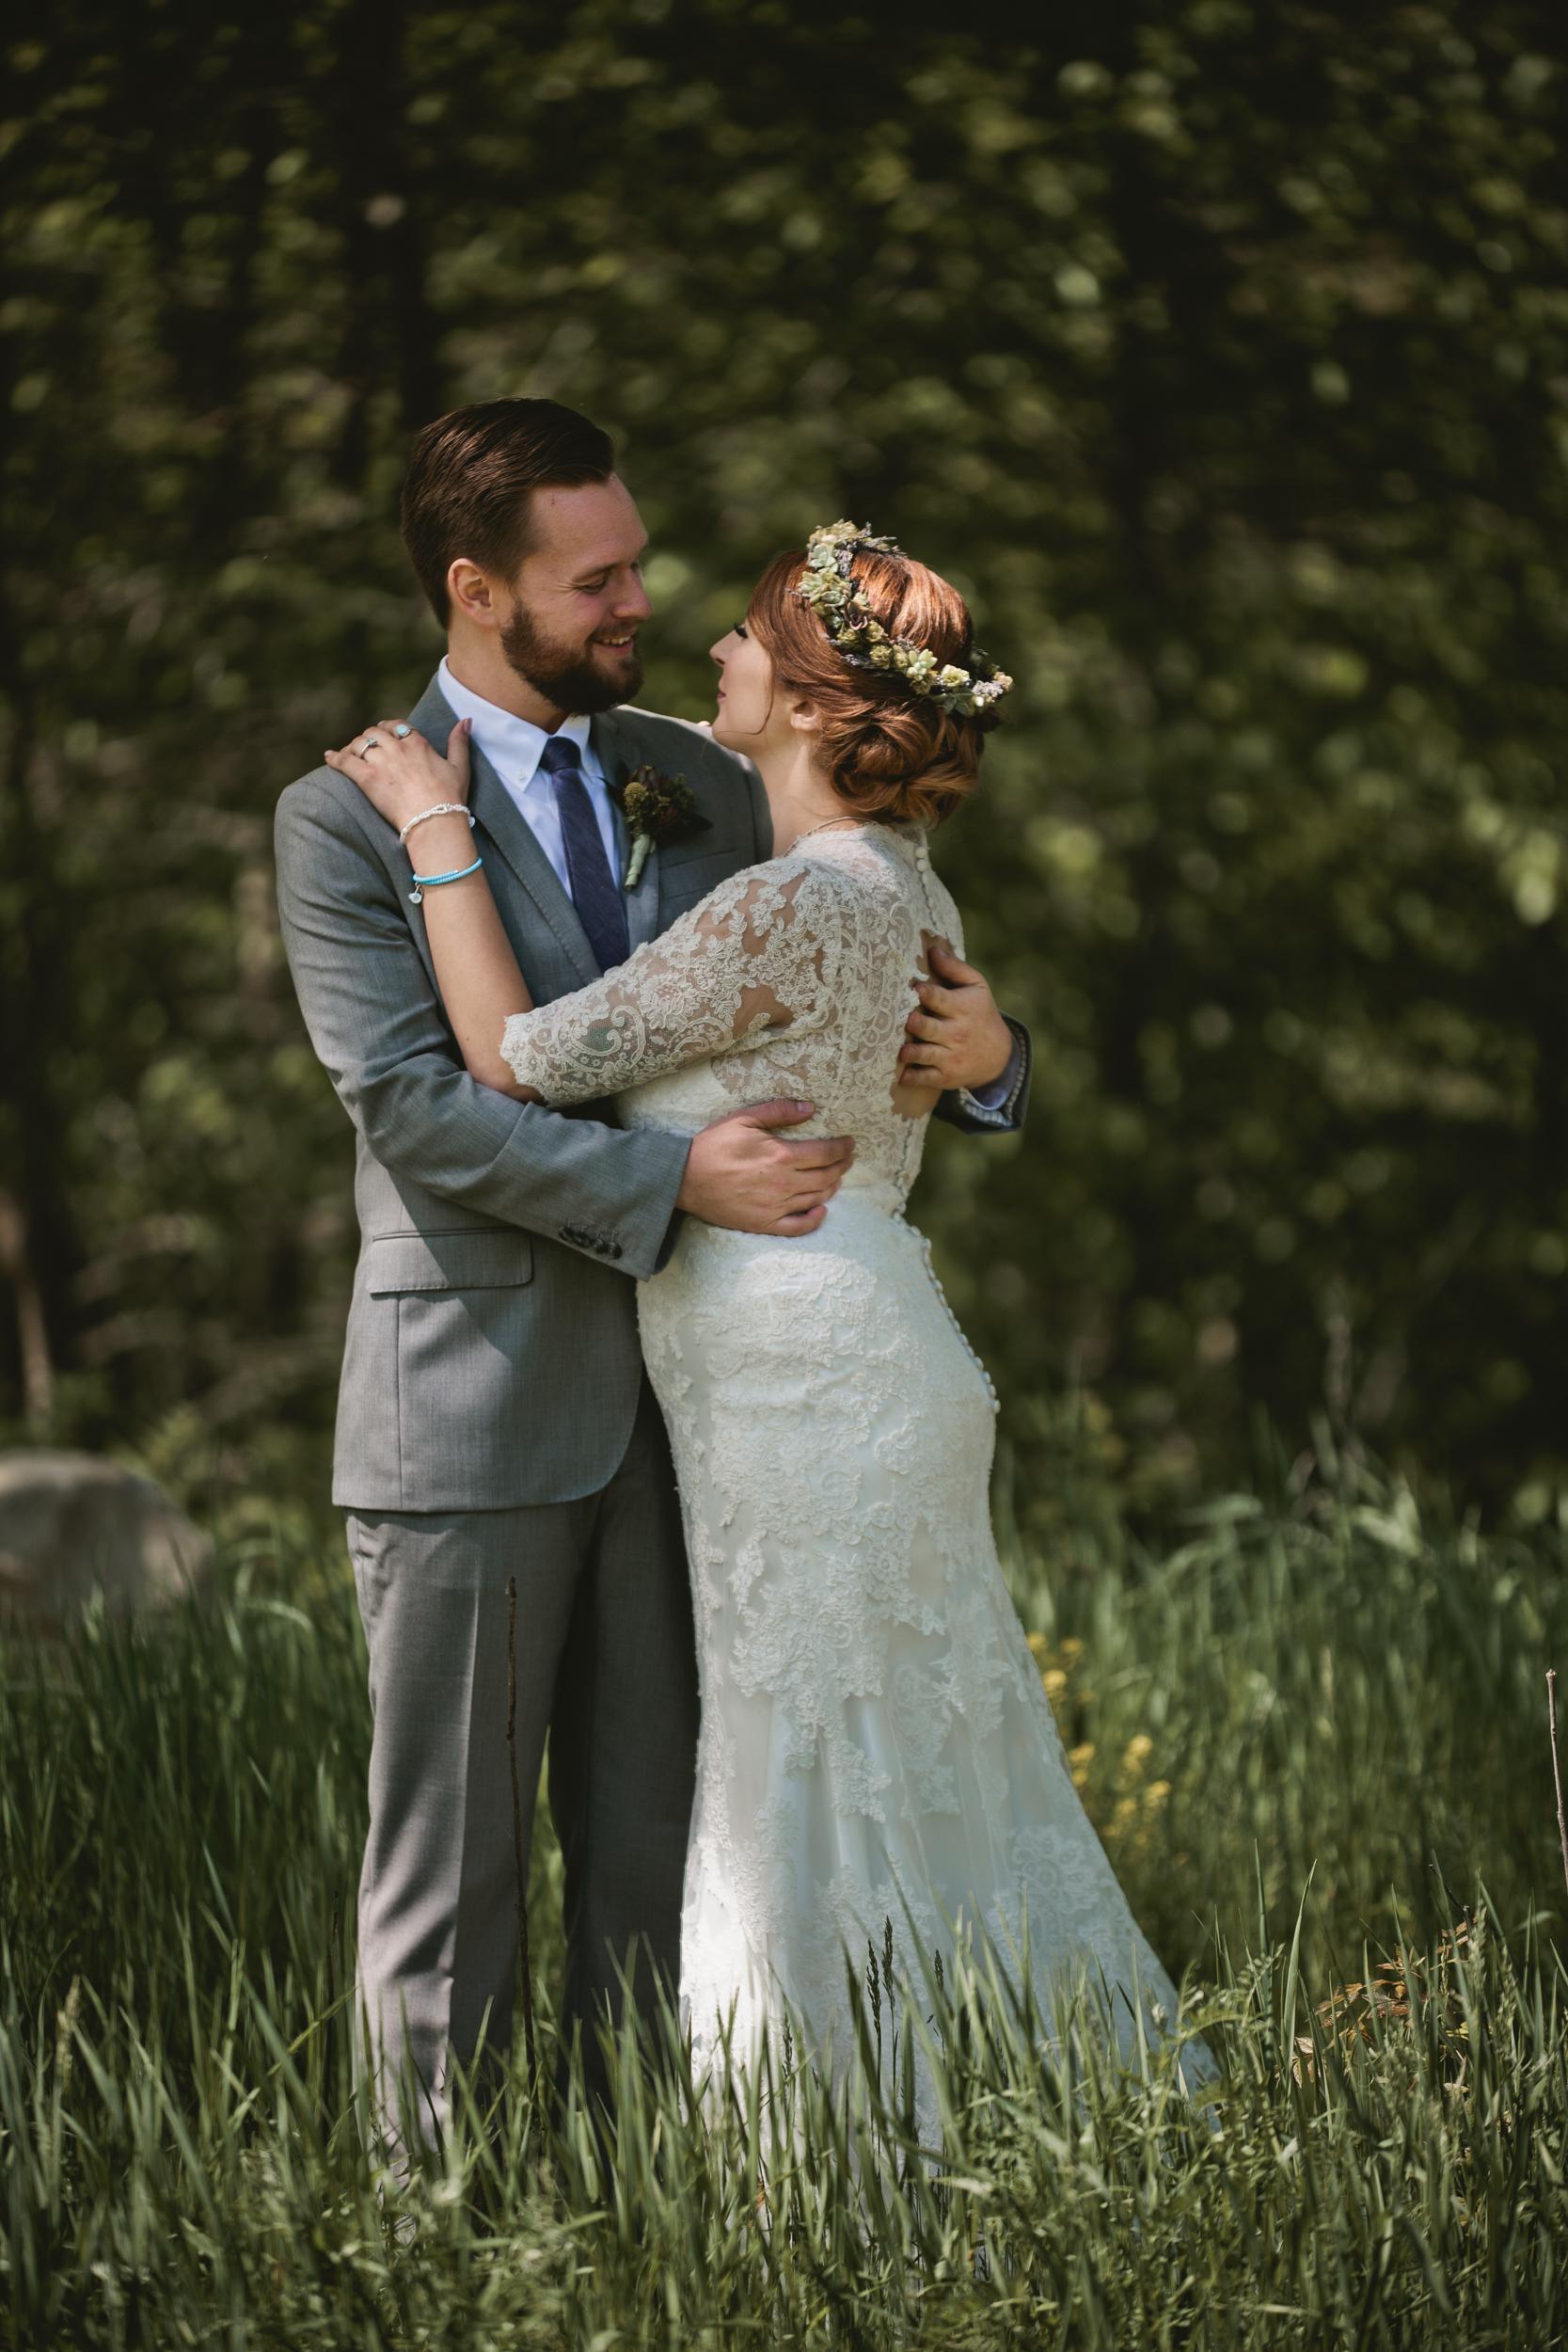 Spring-Meadows-Maine-Wedding-94.jpg